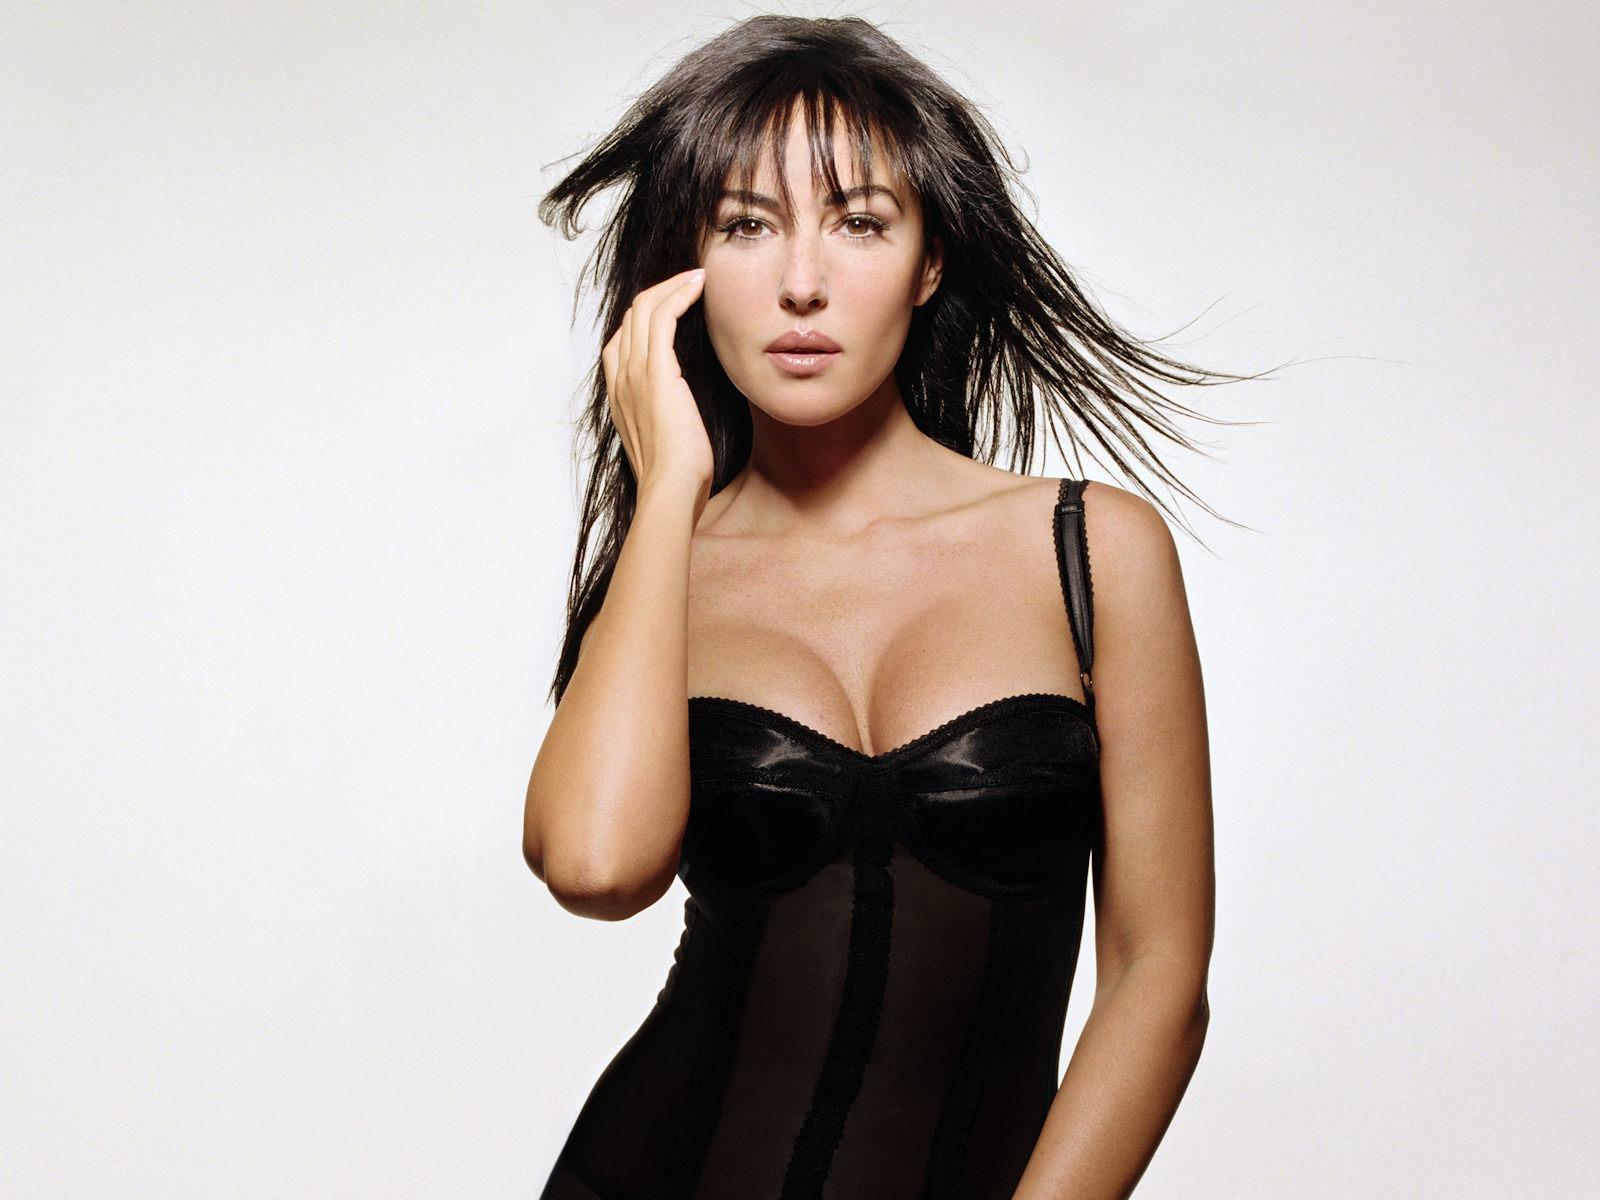 http://4.bp.blogspot.com/-kK6ft95fT7w/TnjtFyZay2I/AAAAAAAAPV4/ULeqYZNwbGU/s1600/Monica-Bellucci_Modelo-Italiana_06.jpg